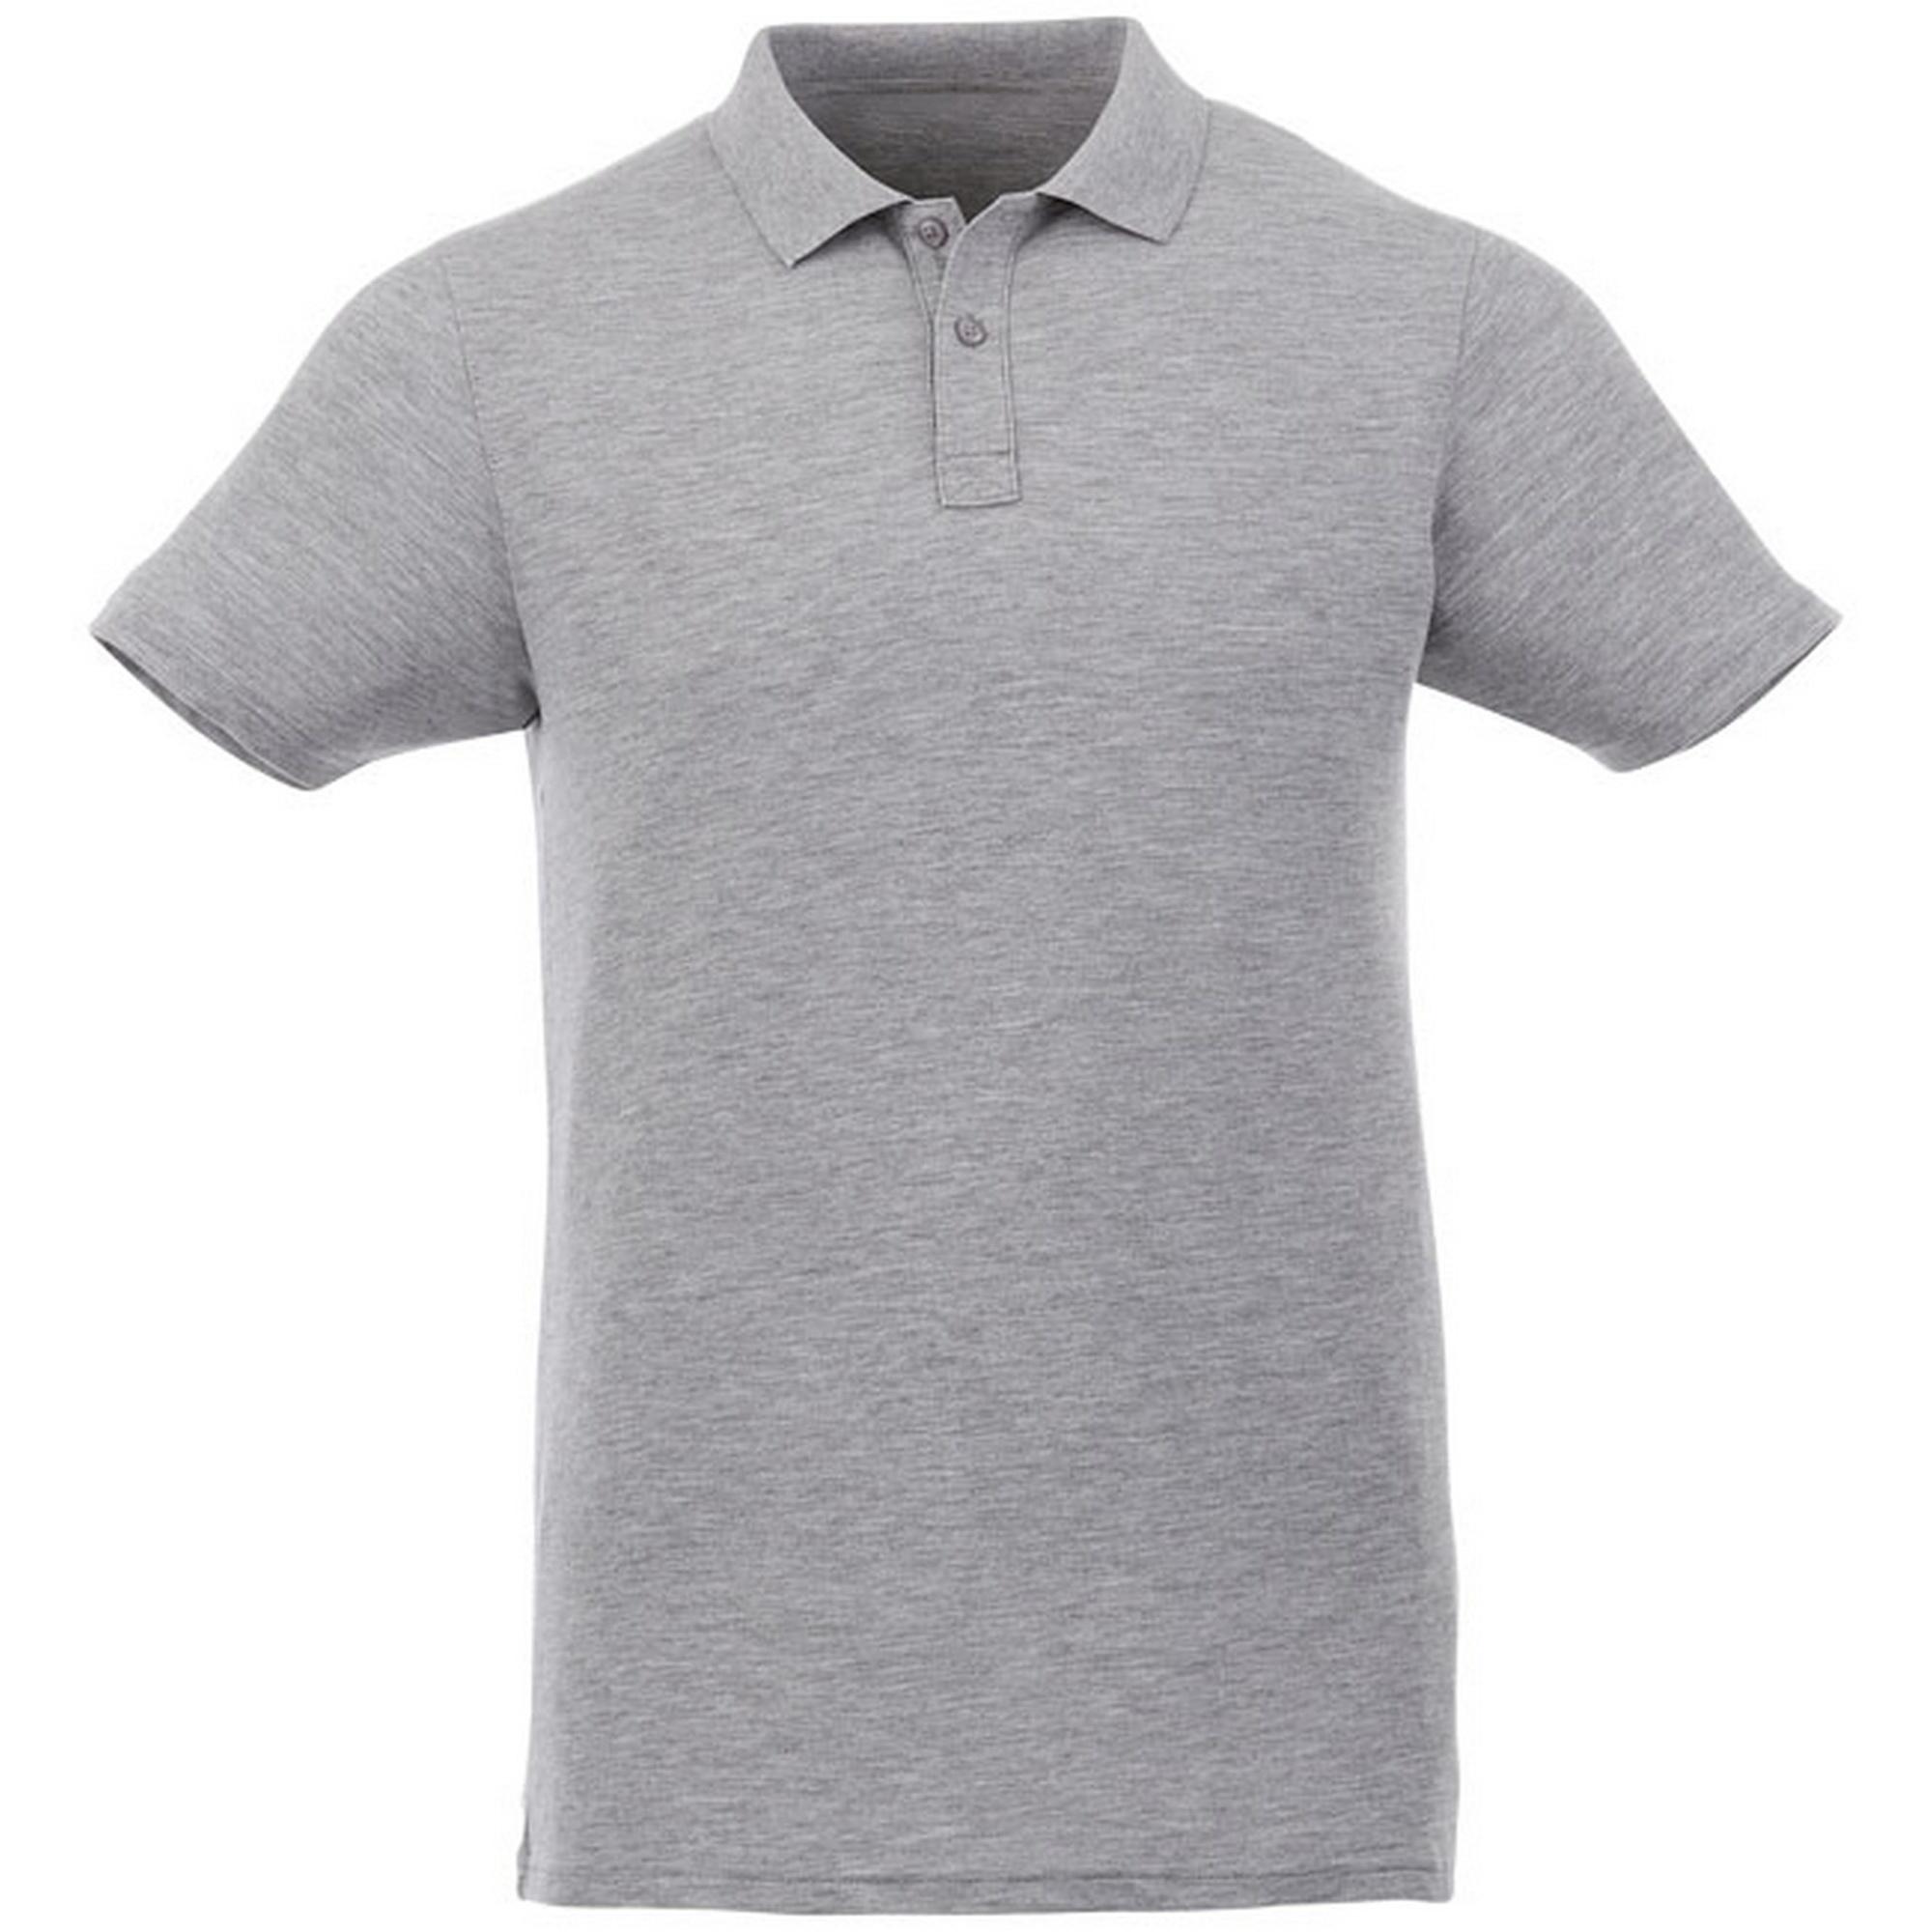 Elevate Liberty Mens Short Sleeve Polo Shirt (XXL) (Heather Grey)